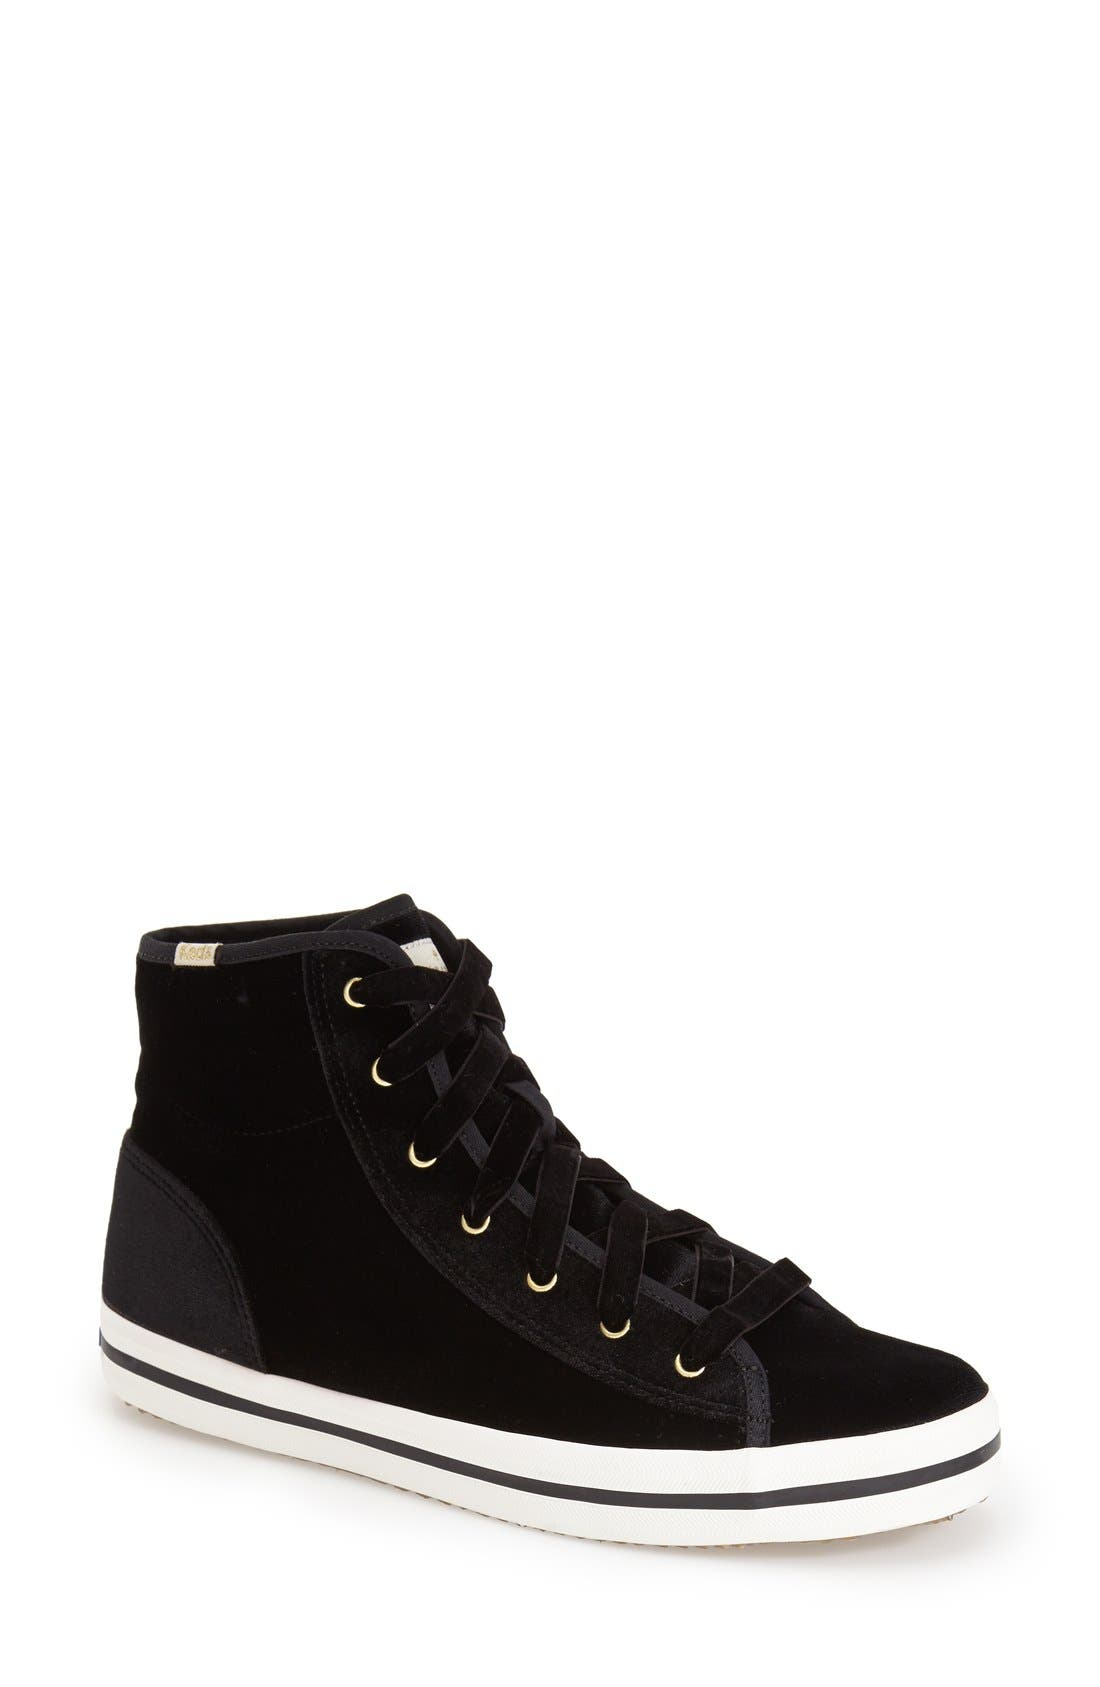 Alternate Image 1 Selected - Keds® for kate spade new york 'dori' high top sneaker (Women)